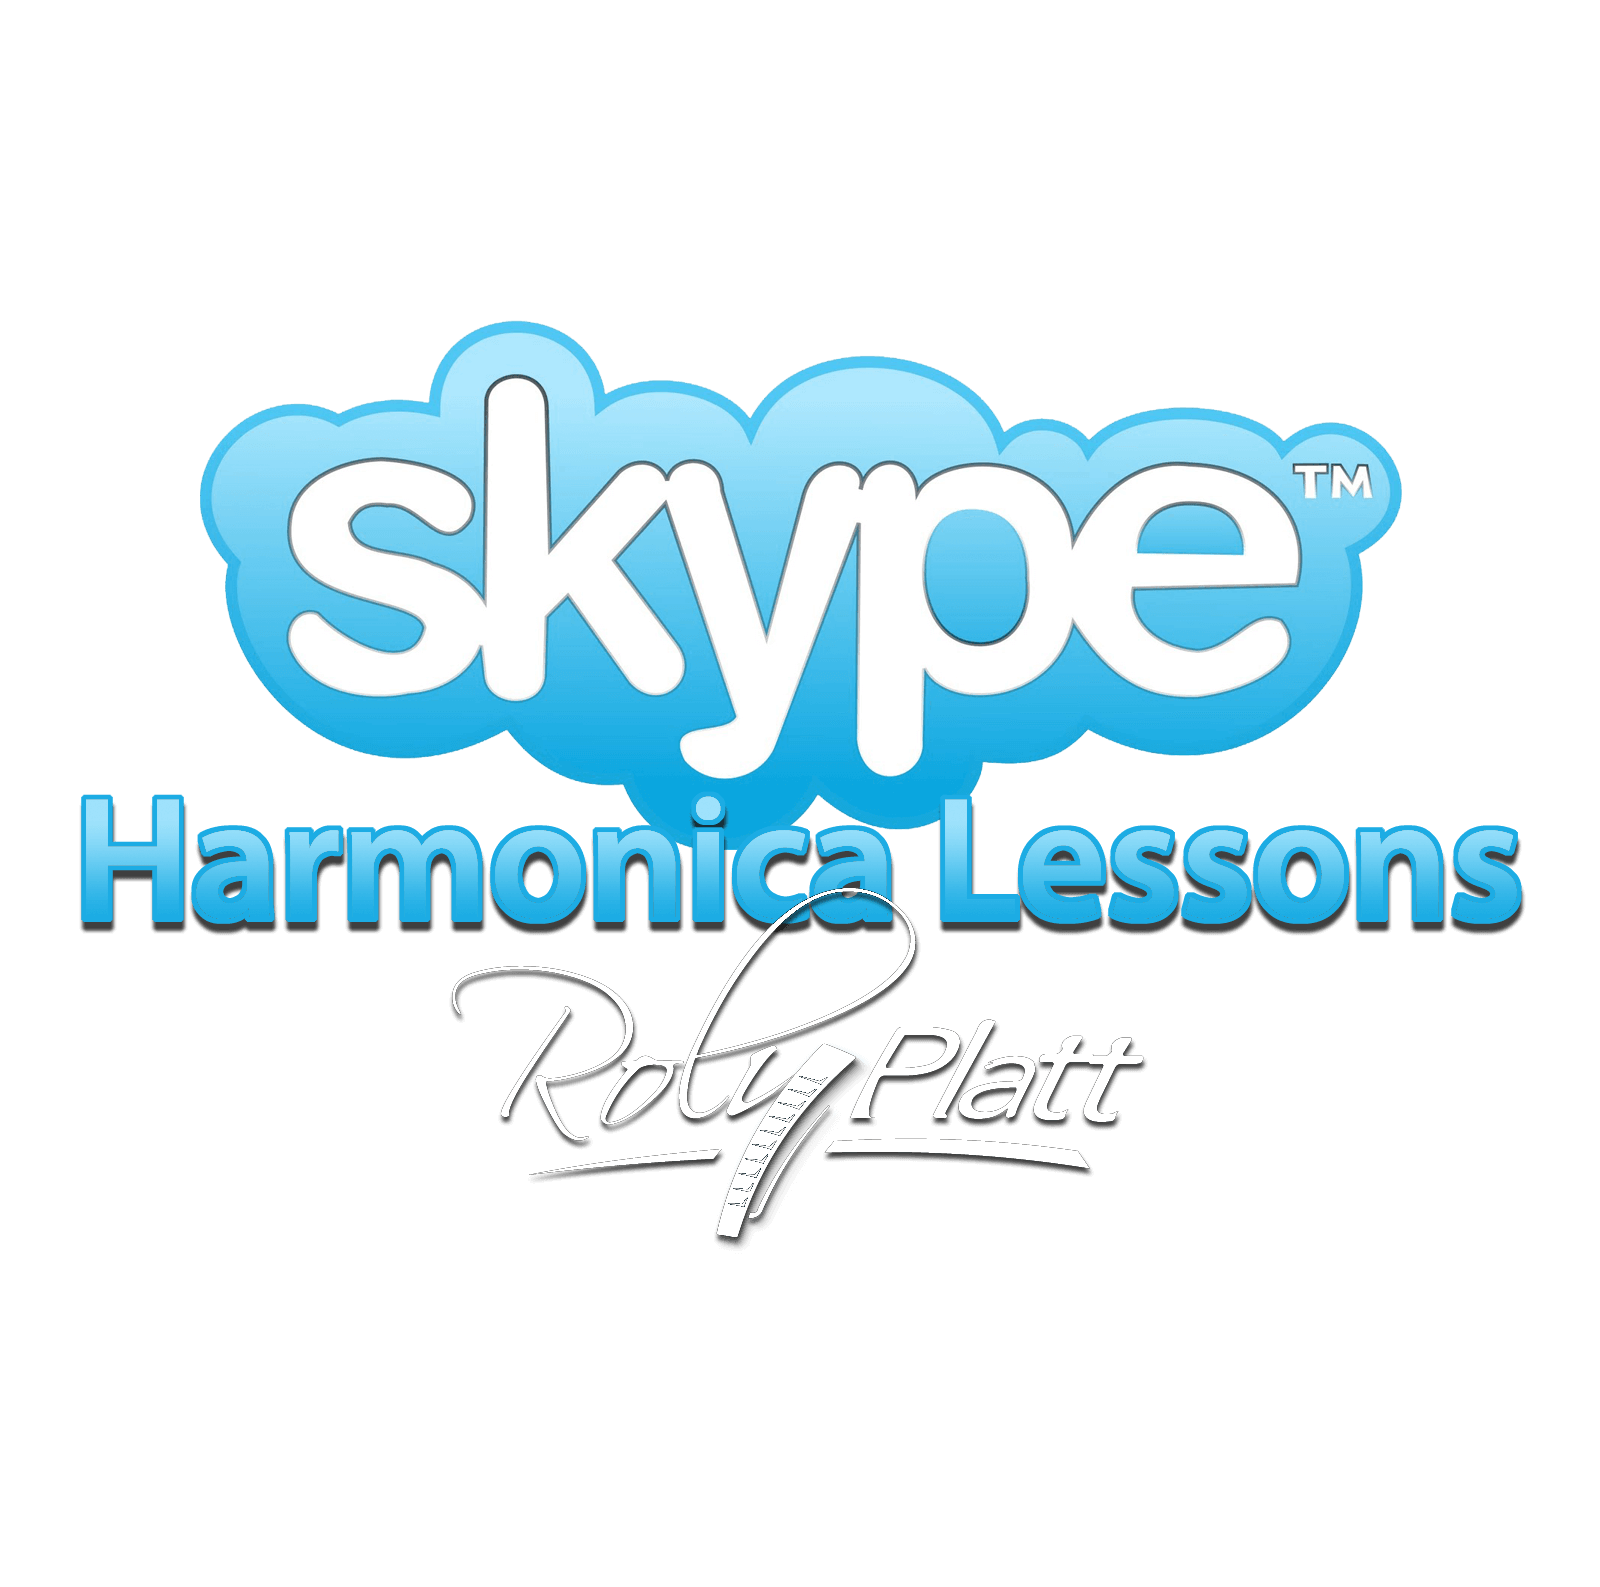 harp lessons on Skype